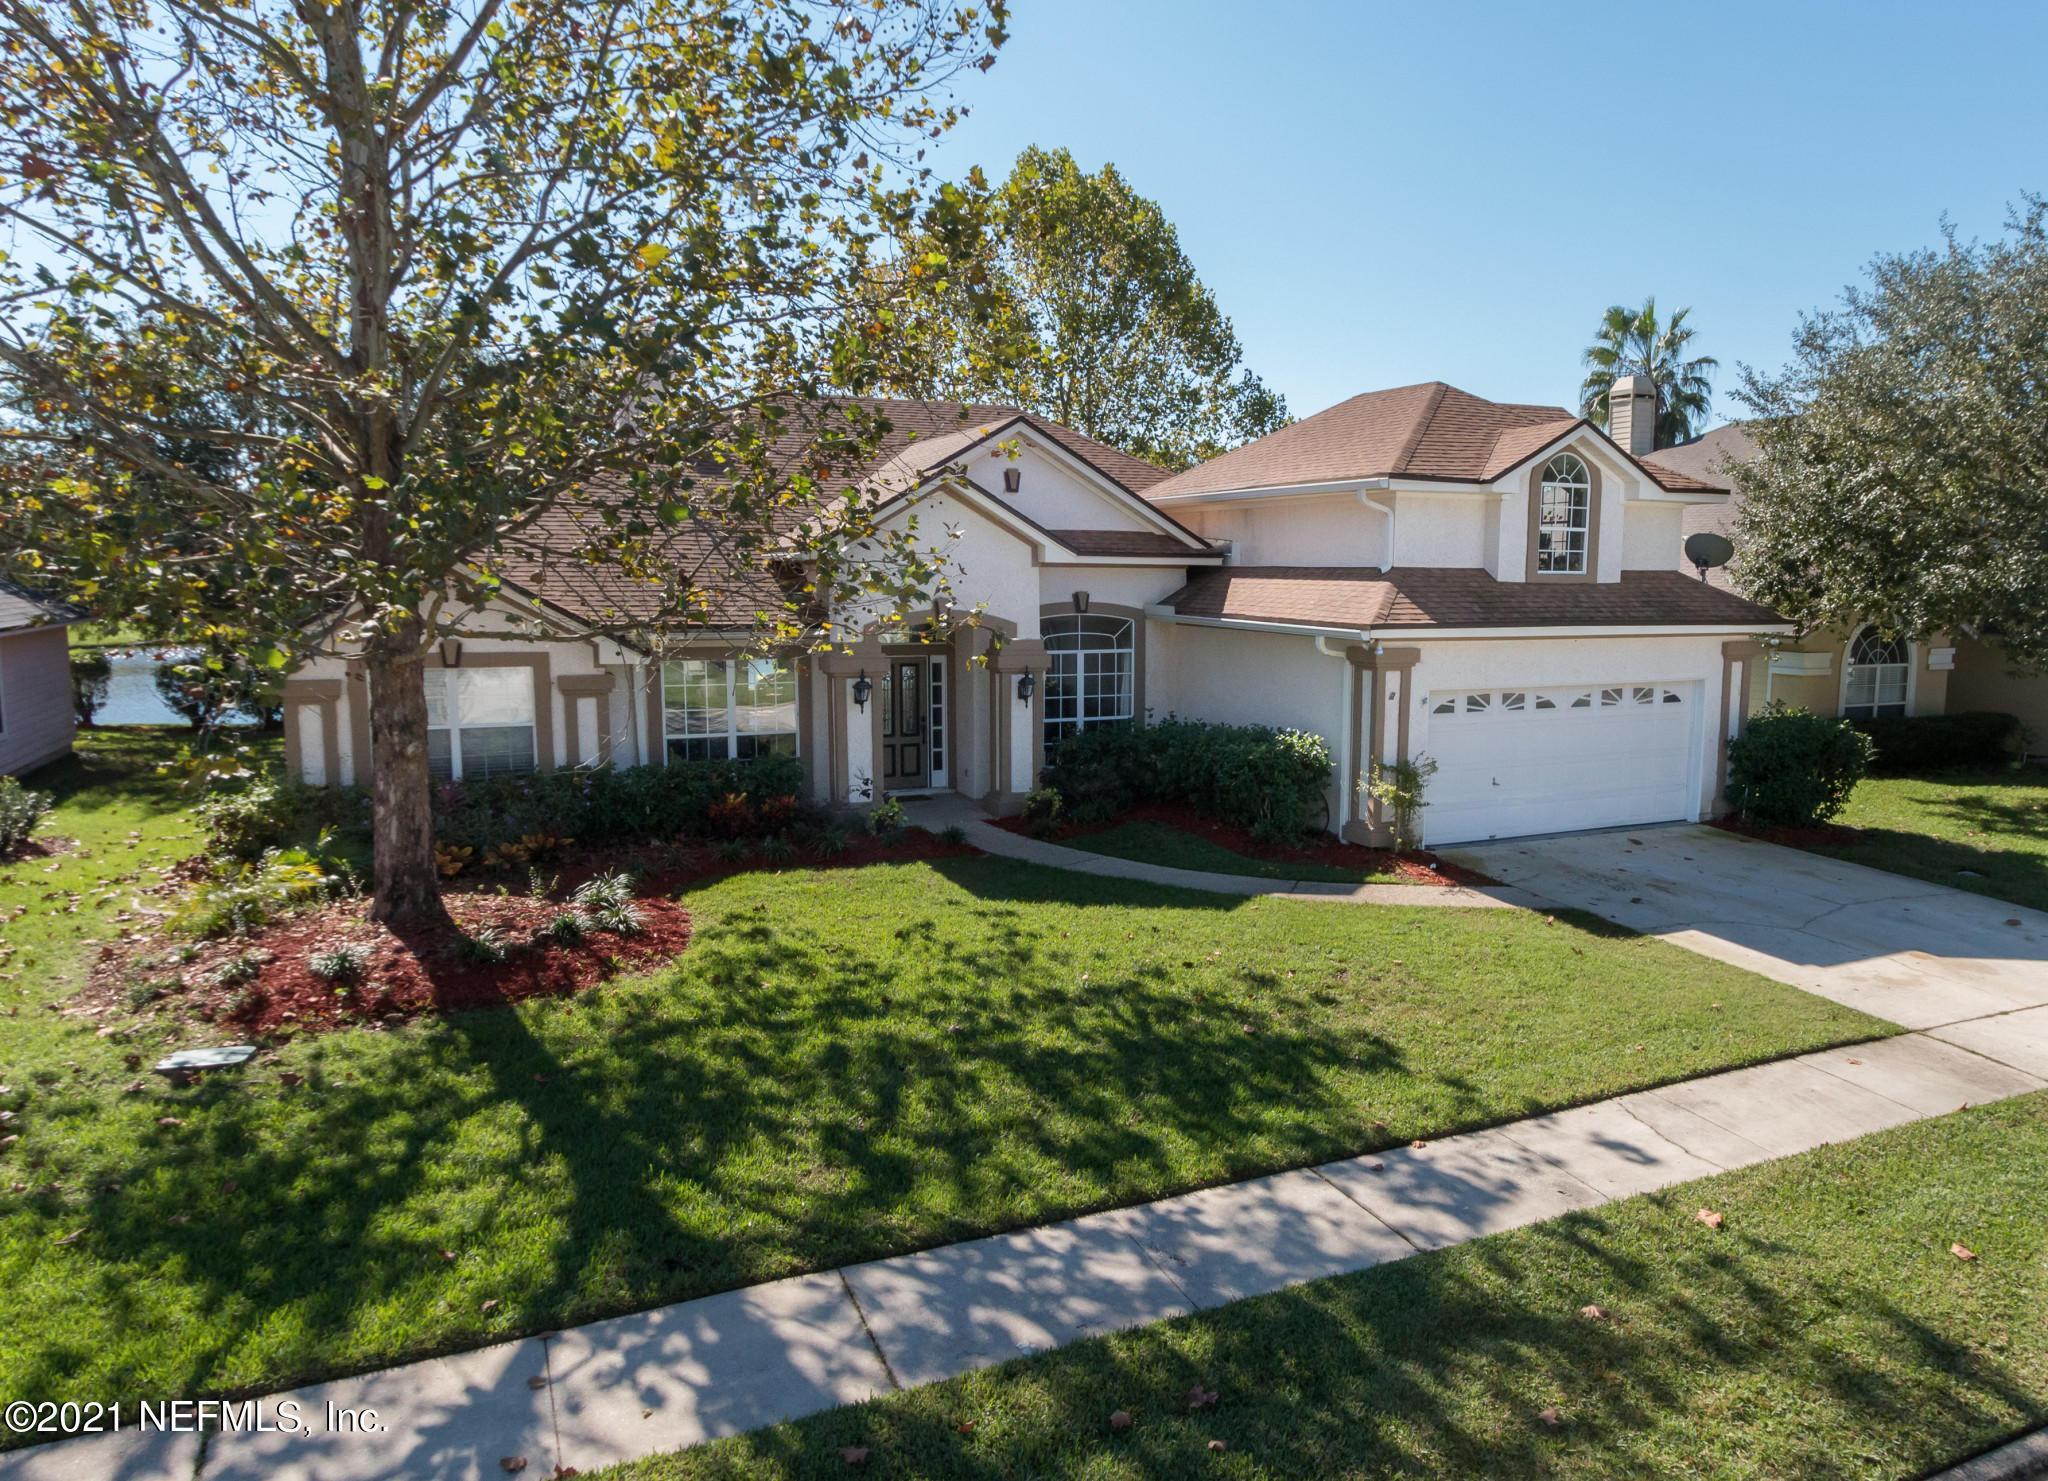 1453 CREEKS EDGE, ORANGE PARK, FLORIDA 32003, 5 Bedrooms Bedrooms, ,3 BathroomsBathrooms,Residential,For sale,CREEKS EDGE,1121816